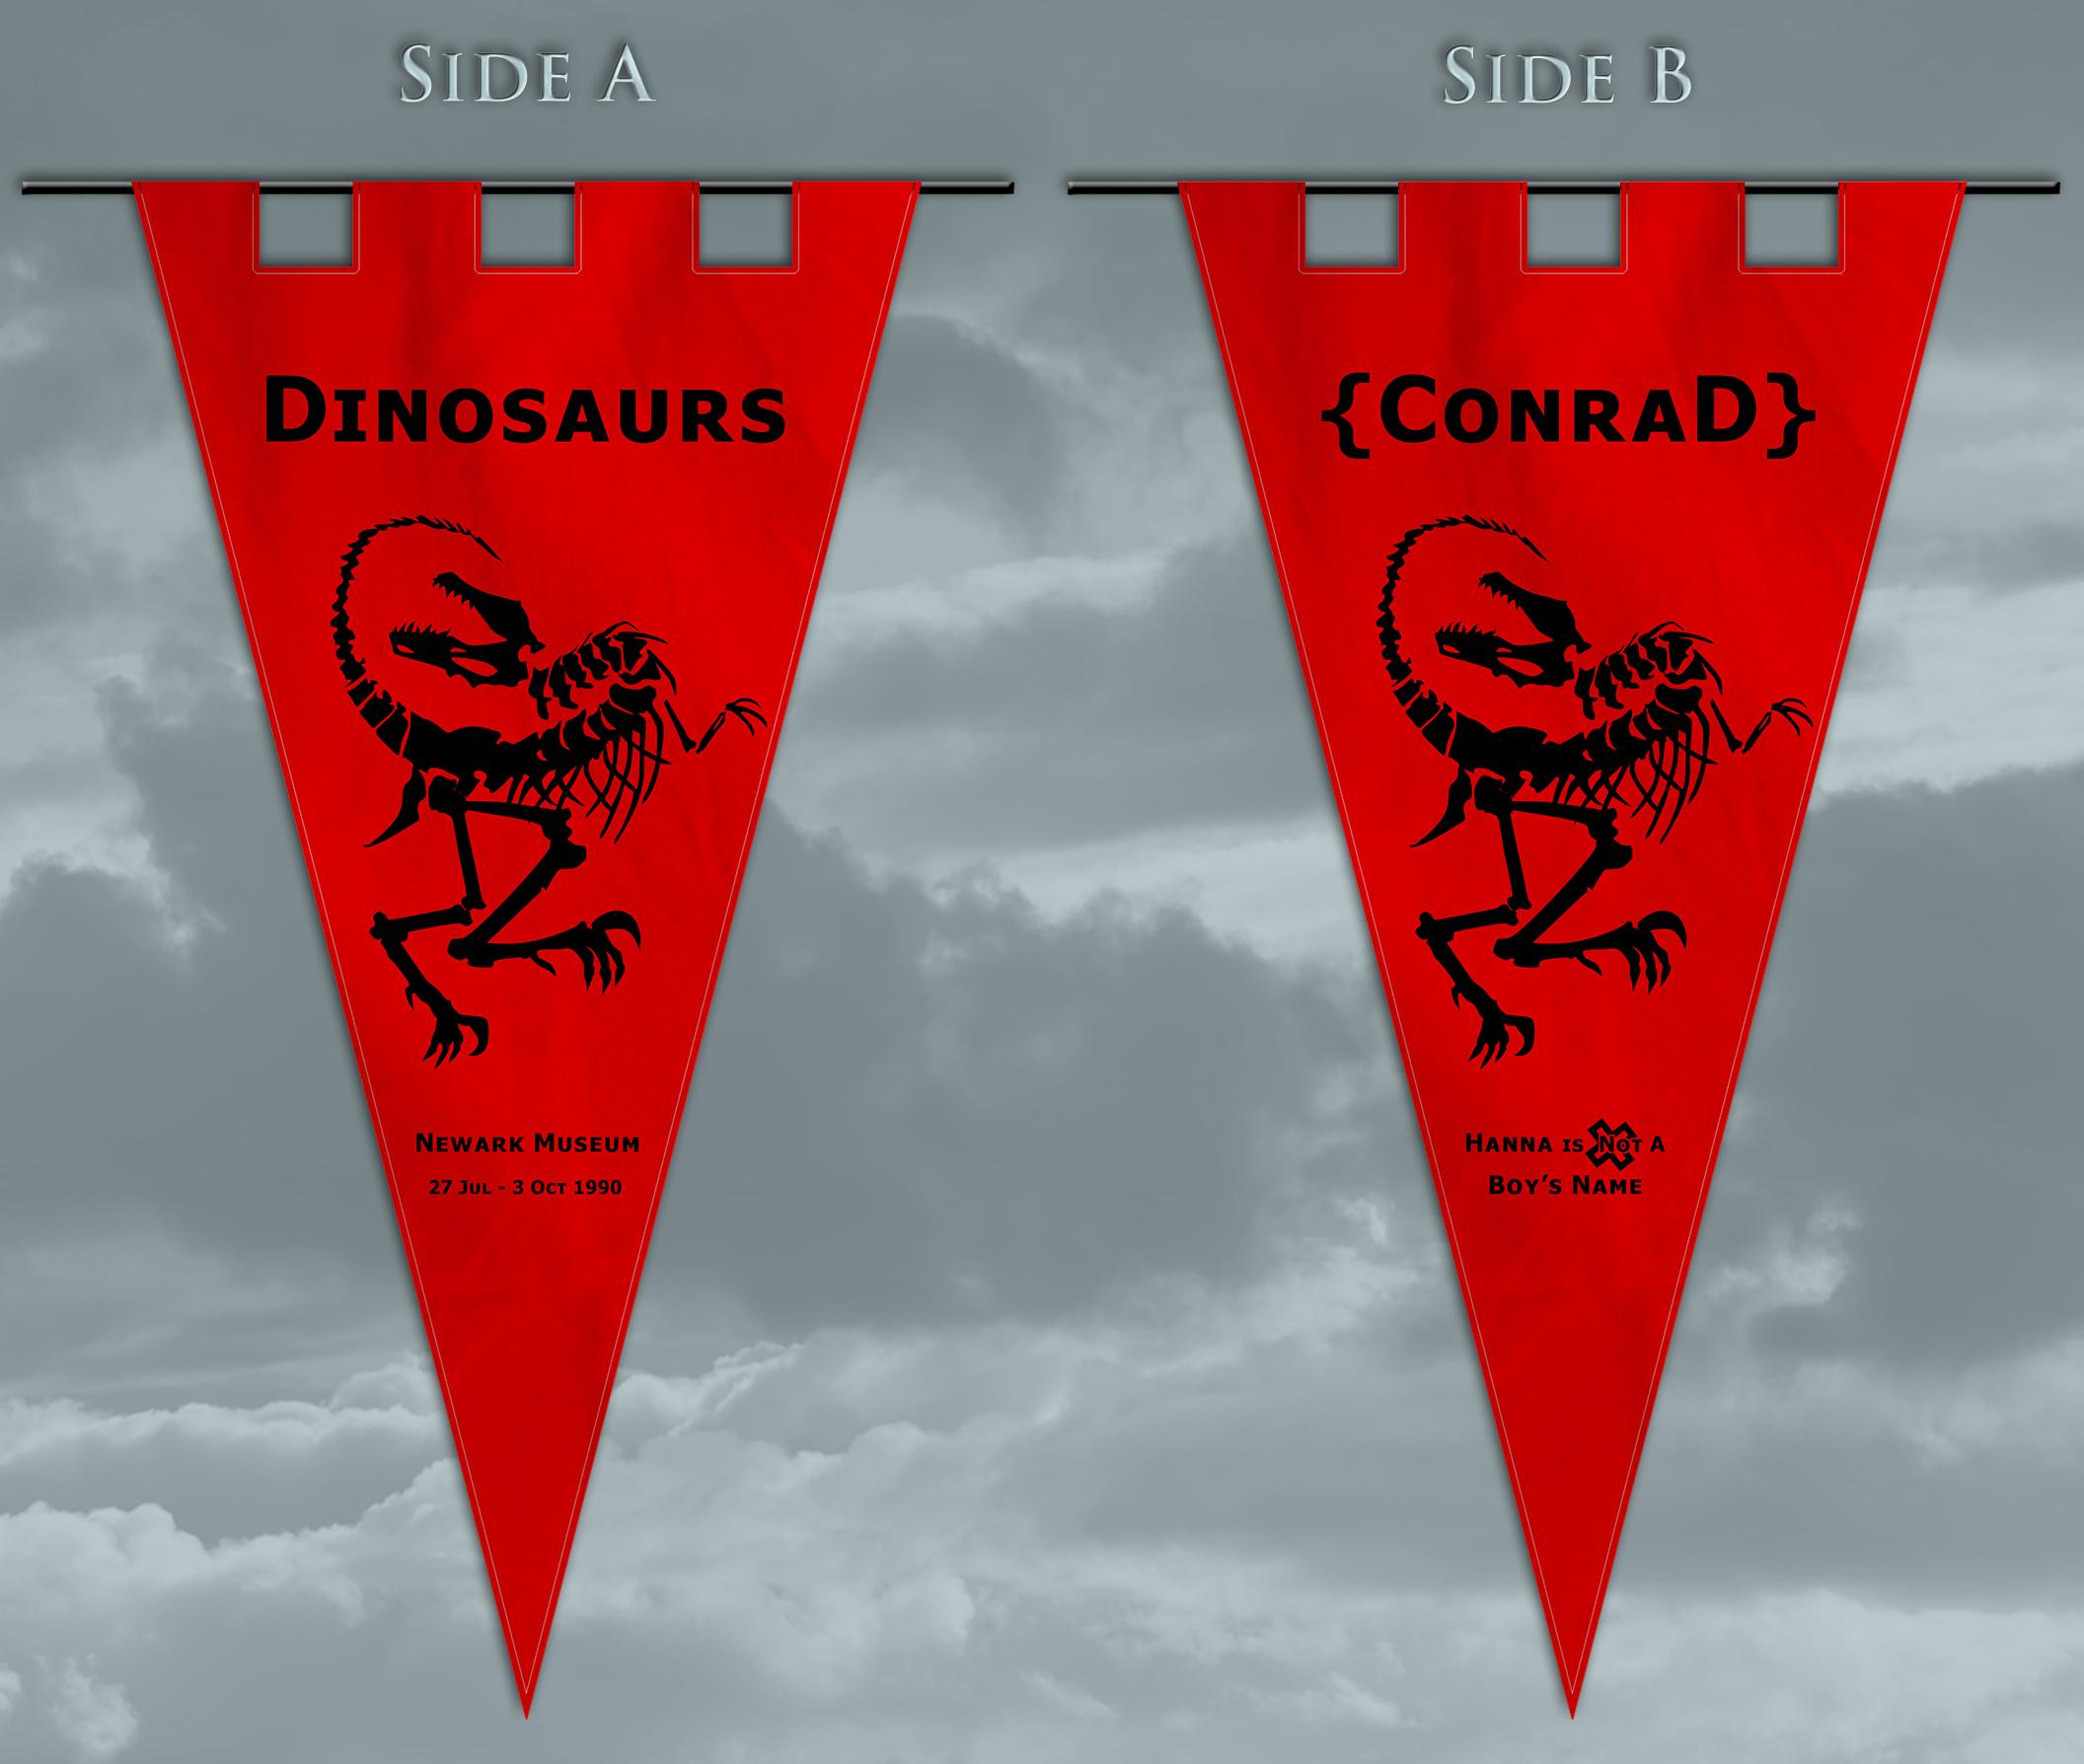 Conrad Banner - Digital Draft by TenayaPyweack